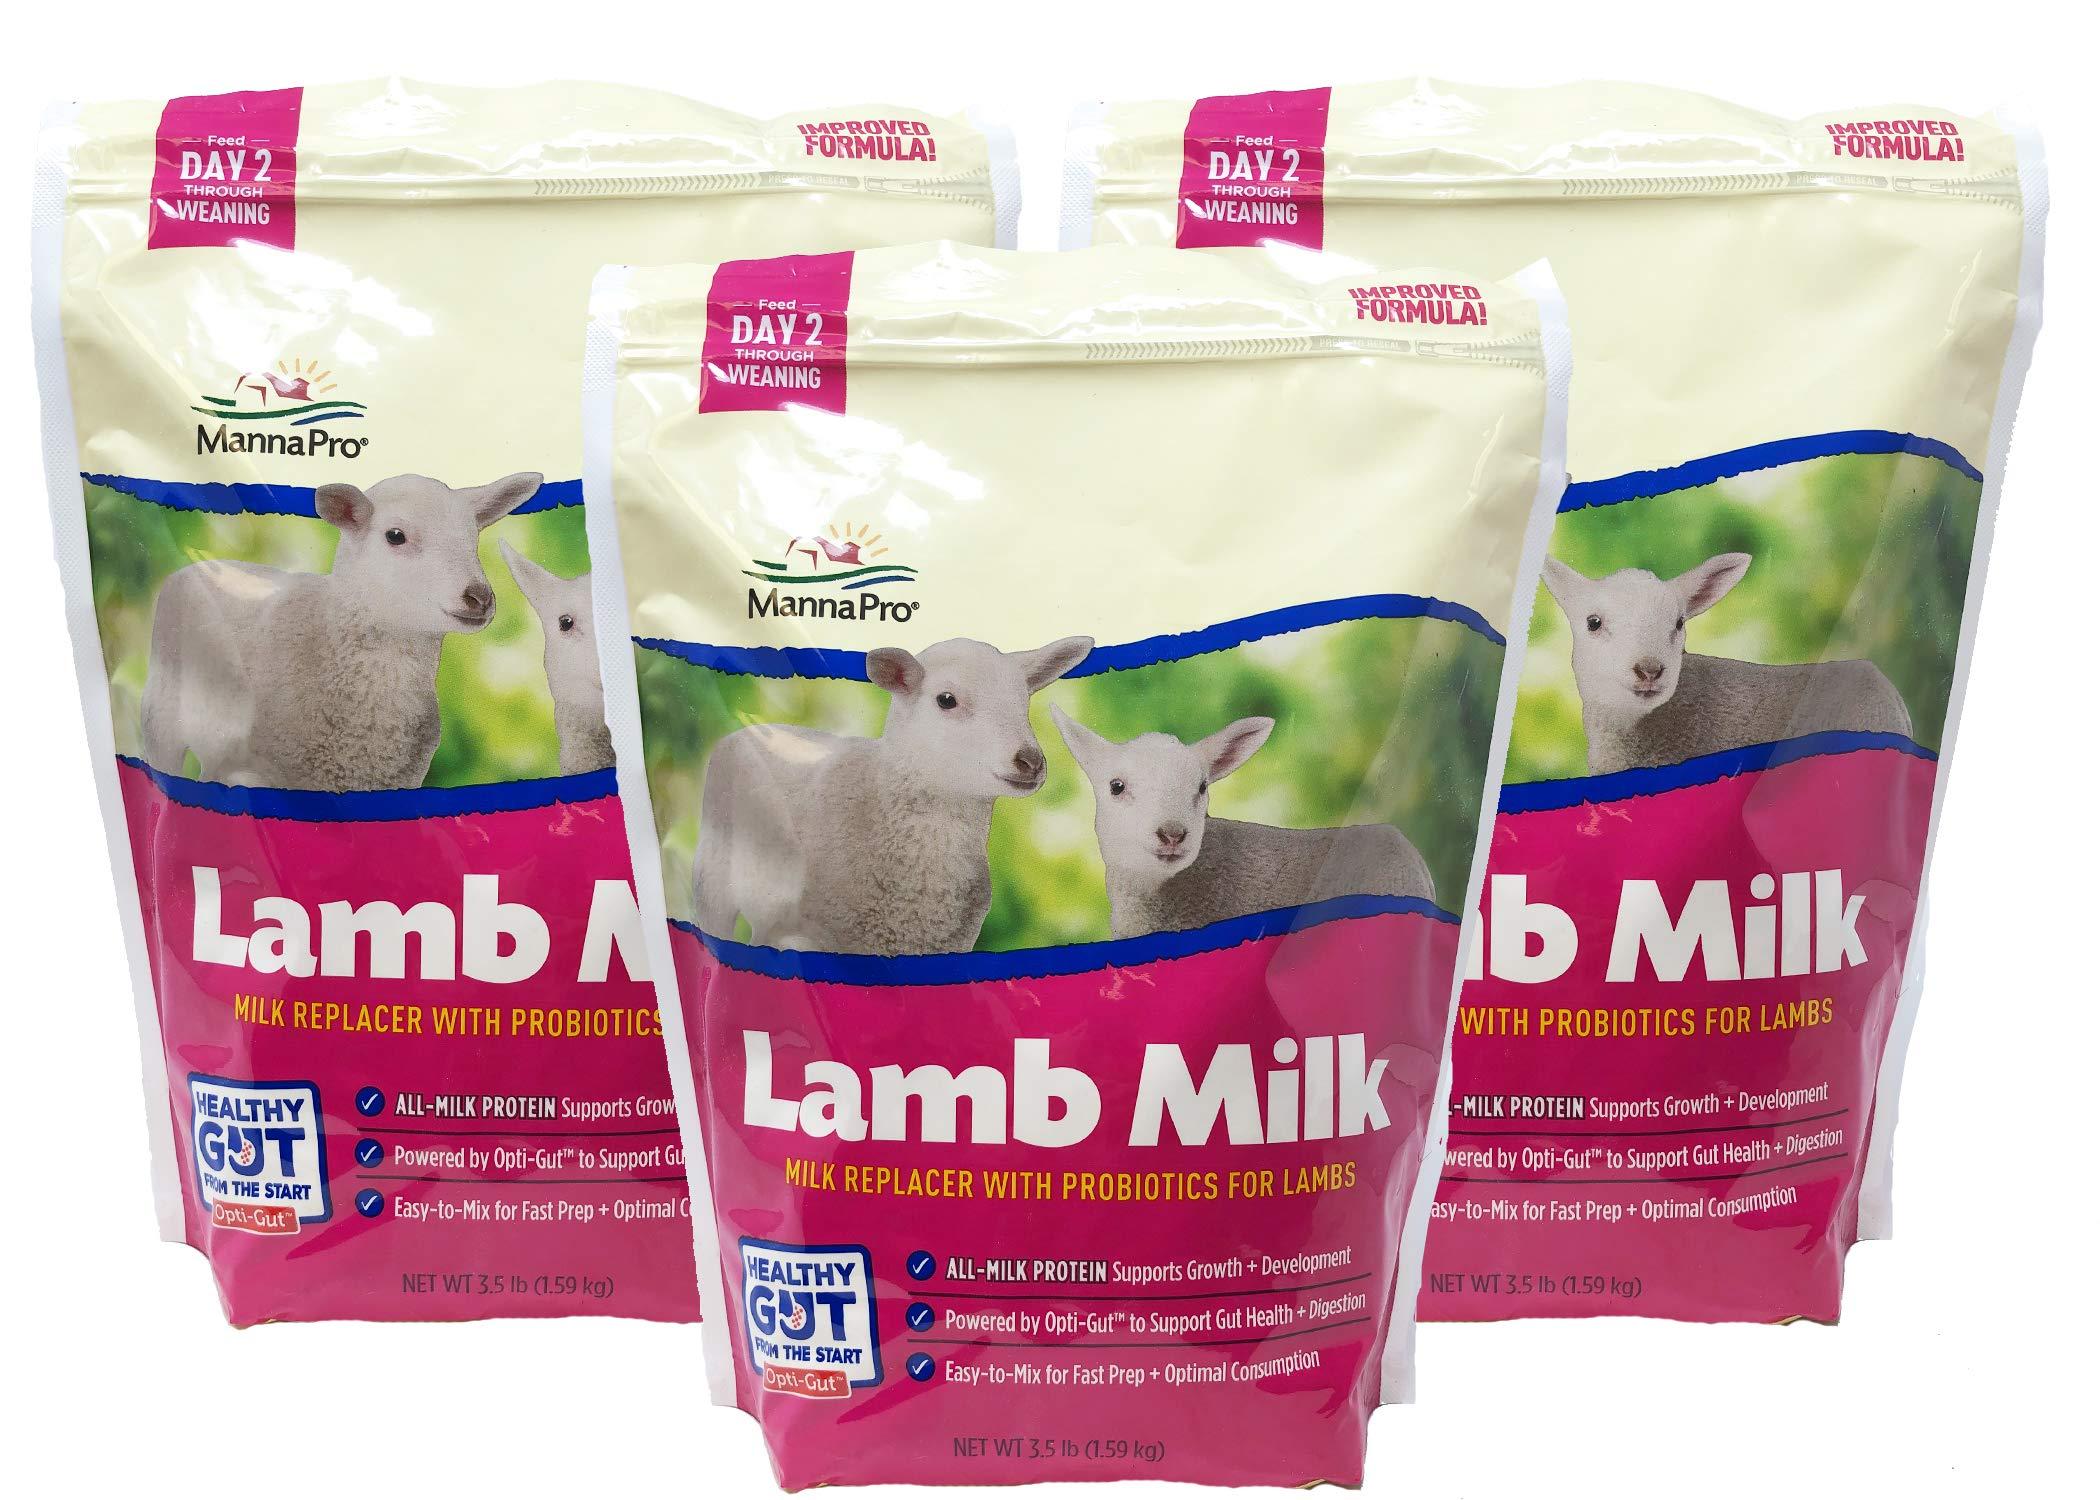 Manna Pro OV0010 Lamb Milk, Pack of 3, White by Manna Pro